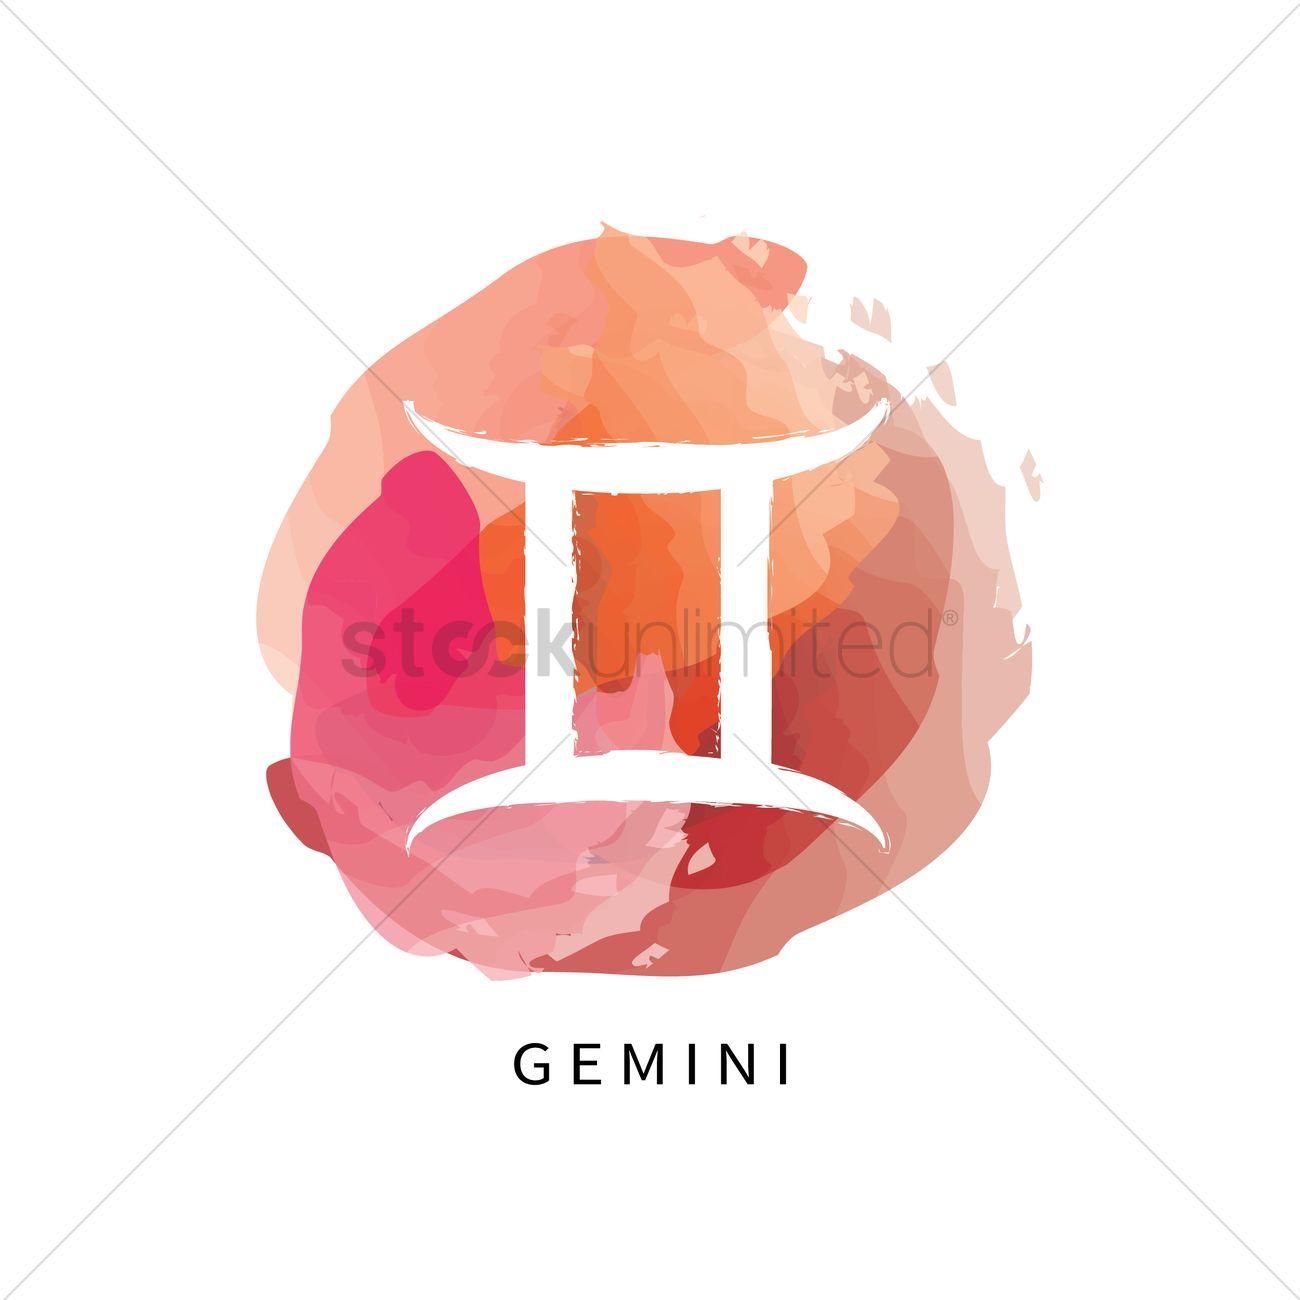 Gemini symbol Vector Image - 1964269 | StockUnlimited